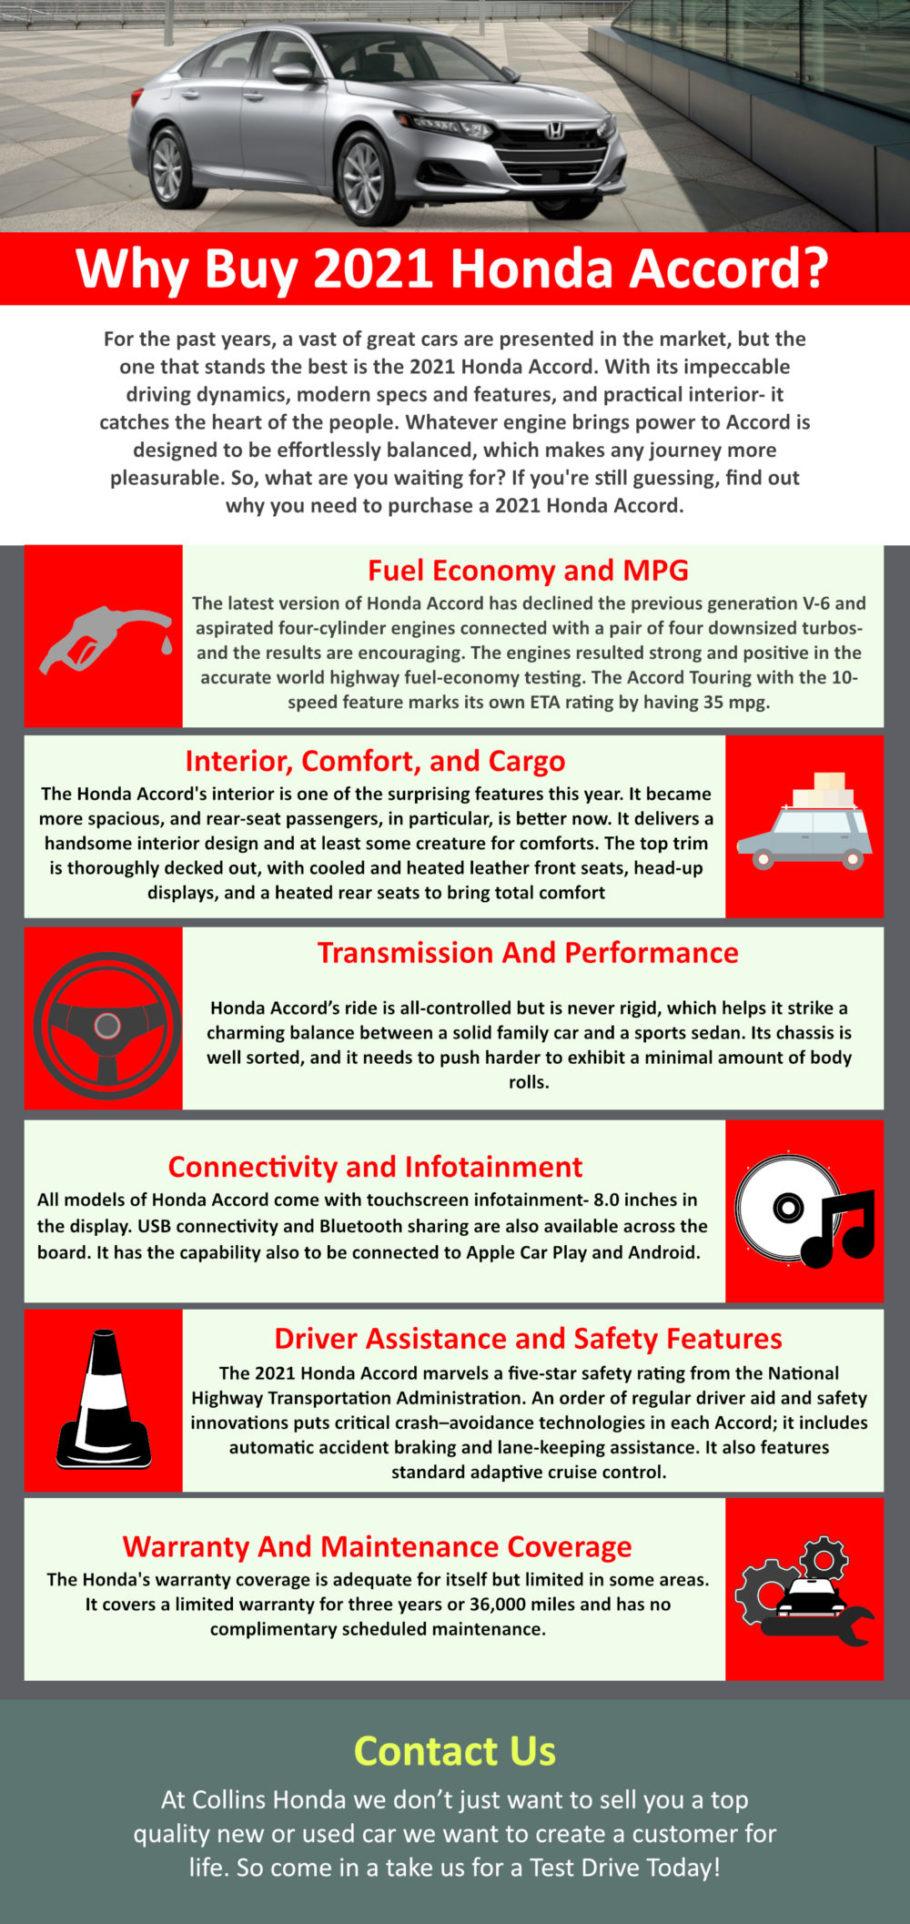 Why Buy 2021 Honda Accord?